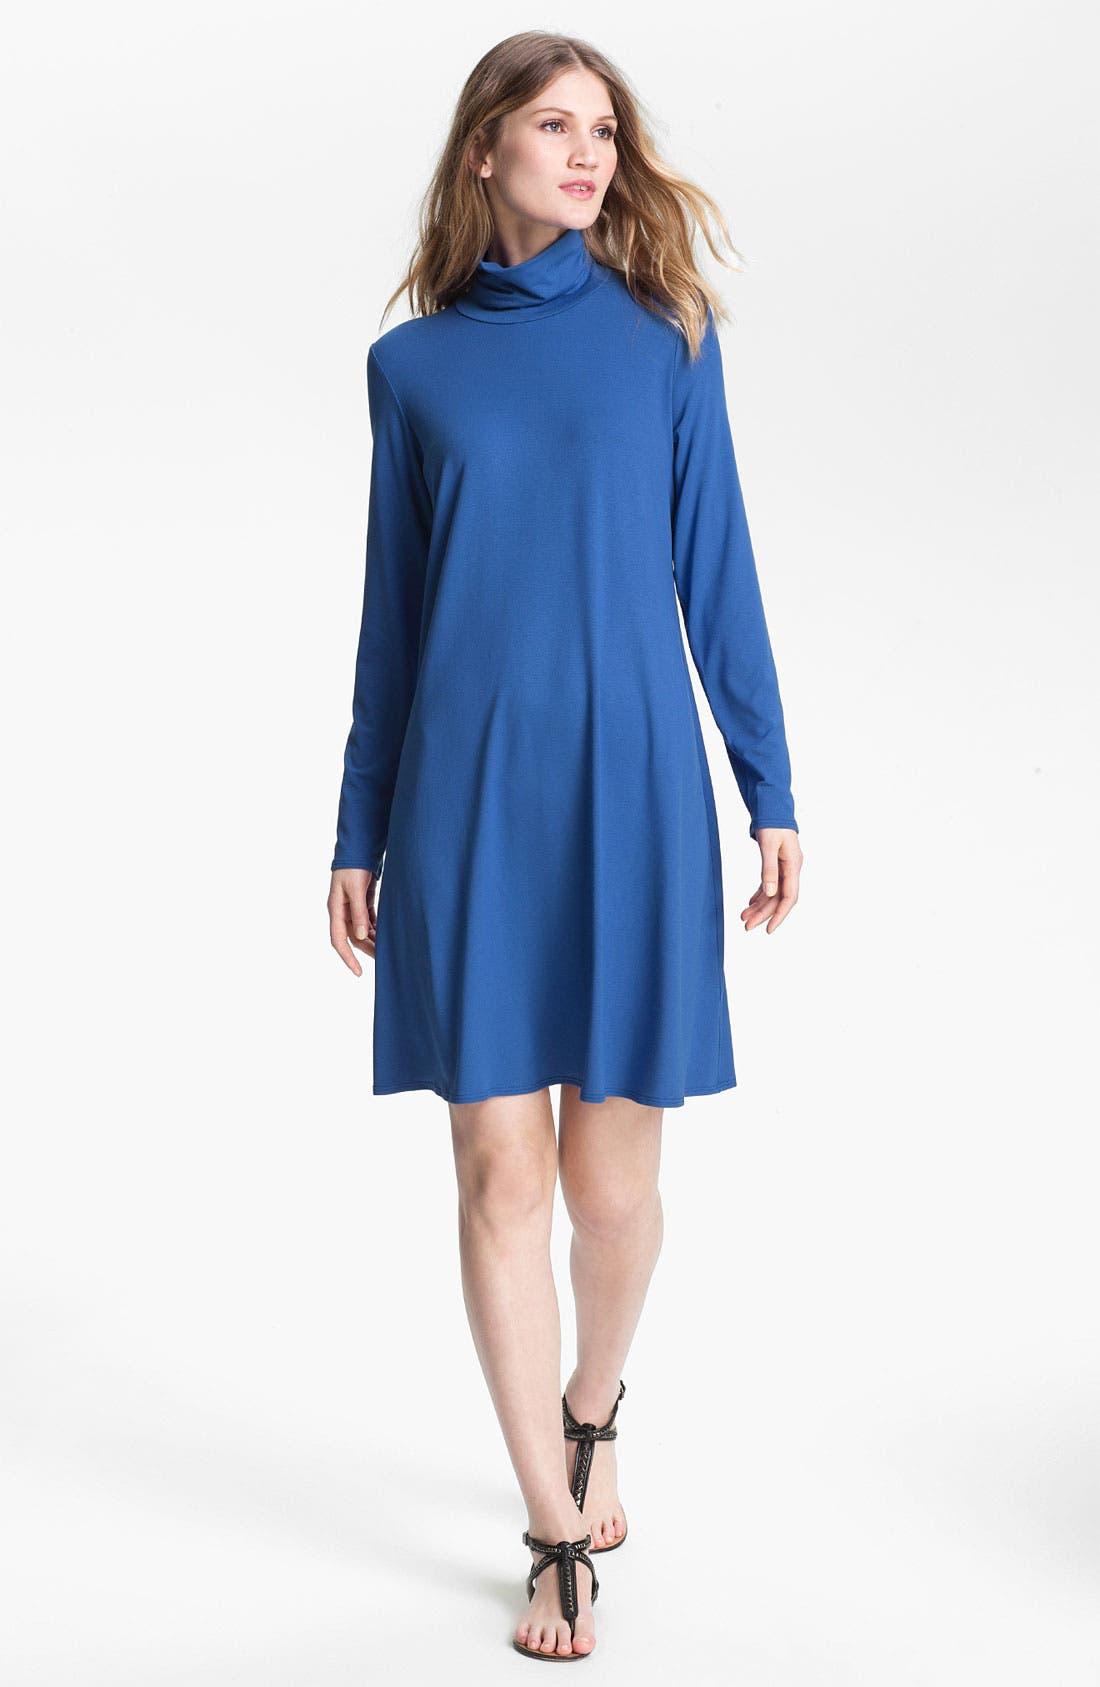 Alternate Image 1 Selected - Eileen Fisher Scrunch Neck Dress